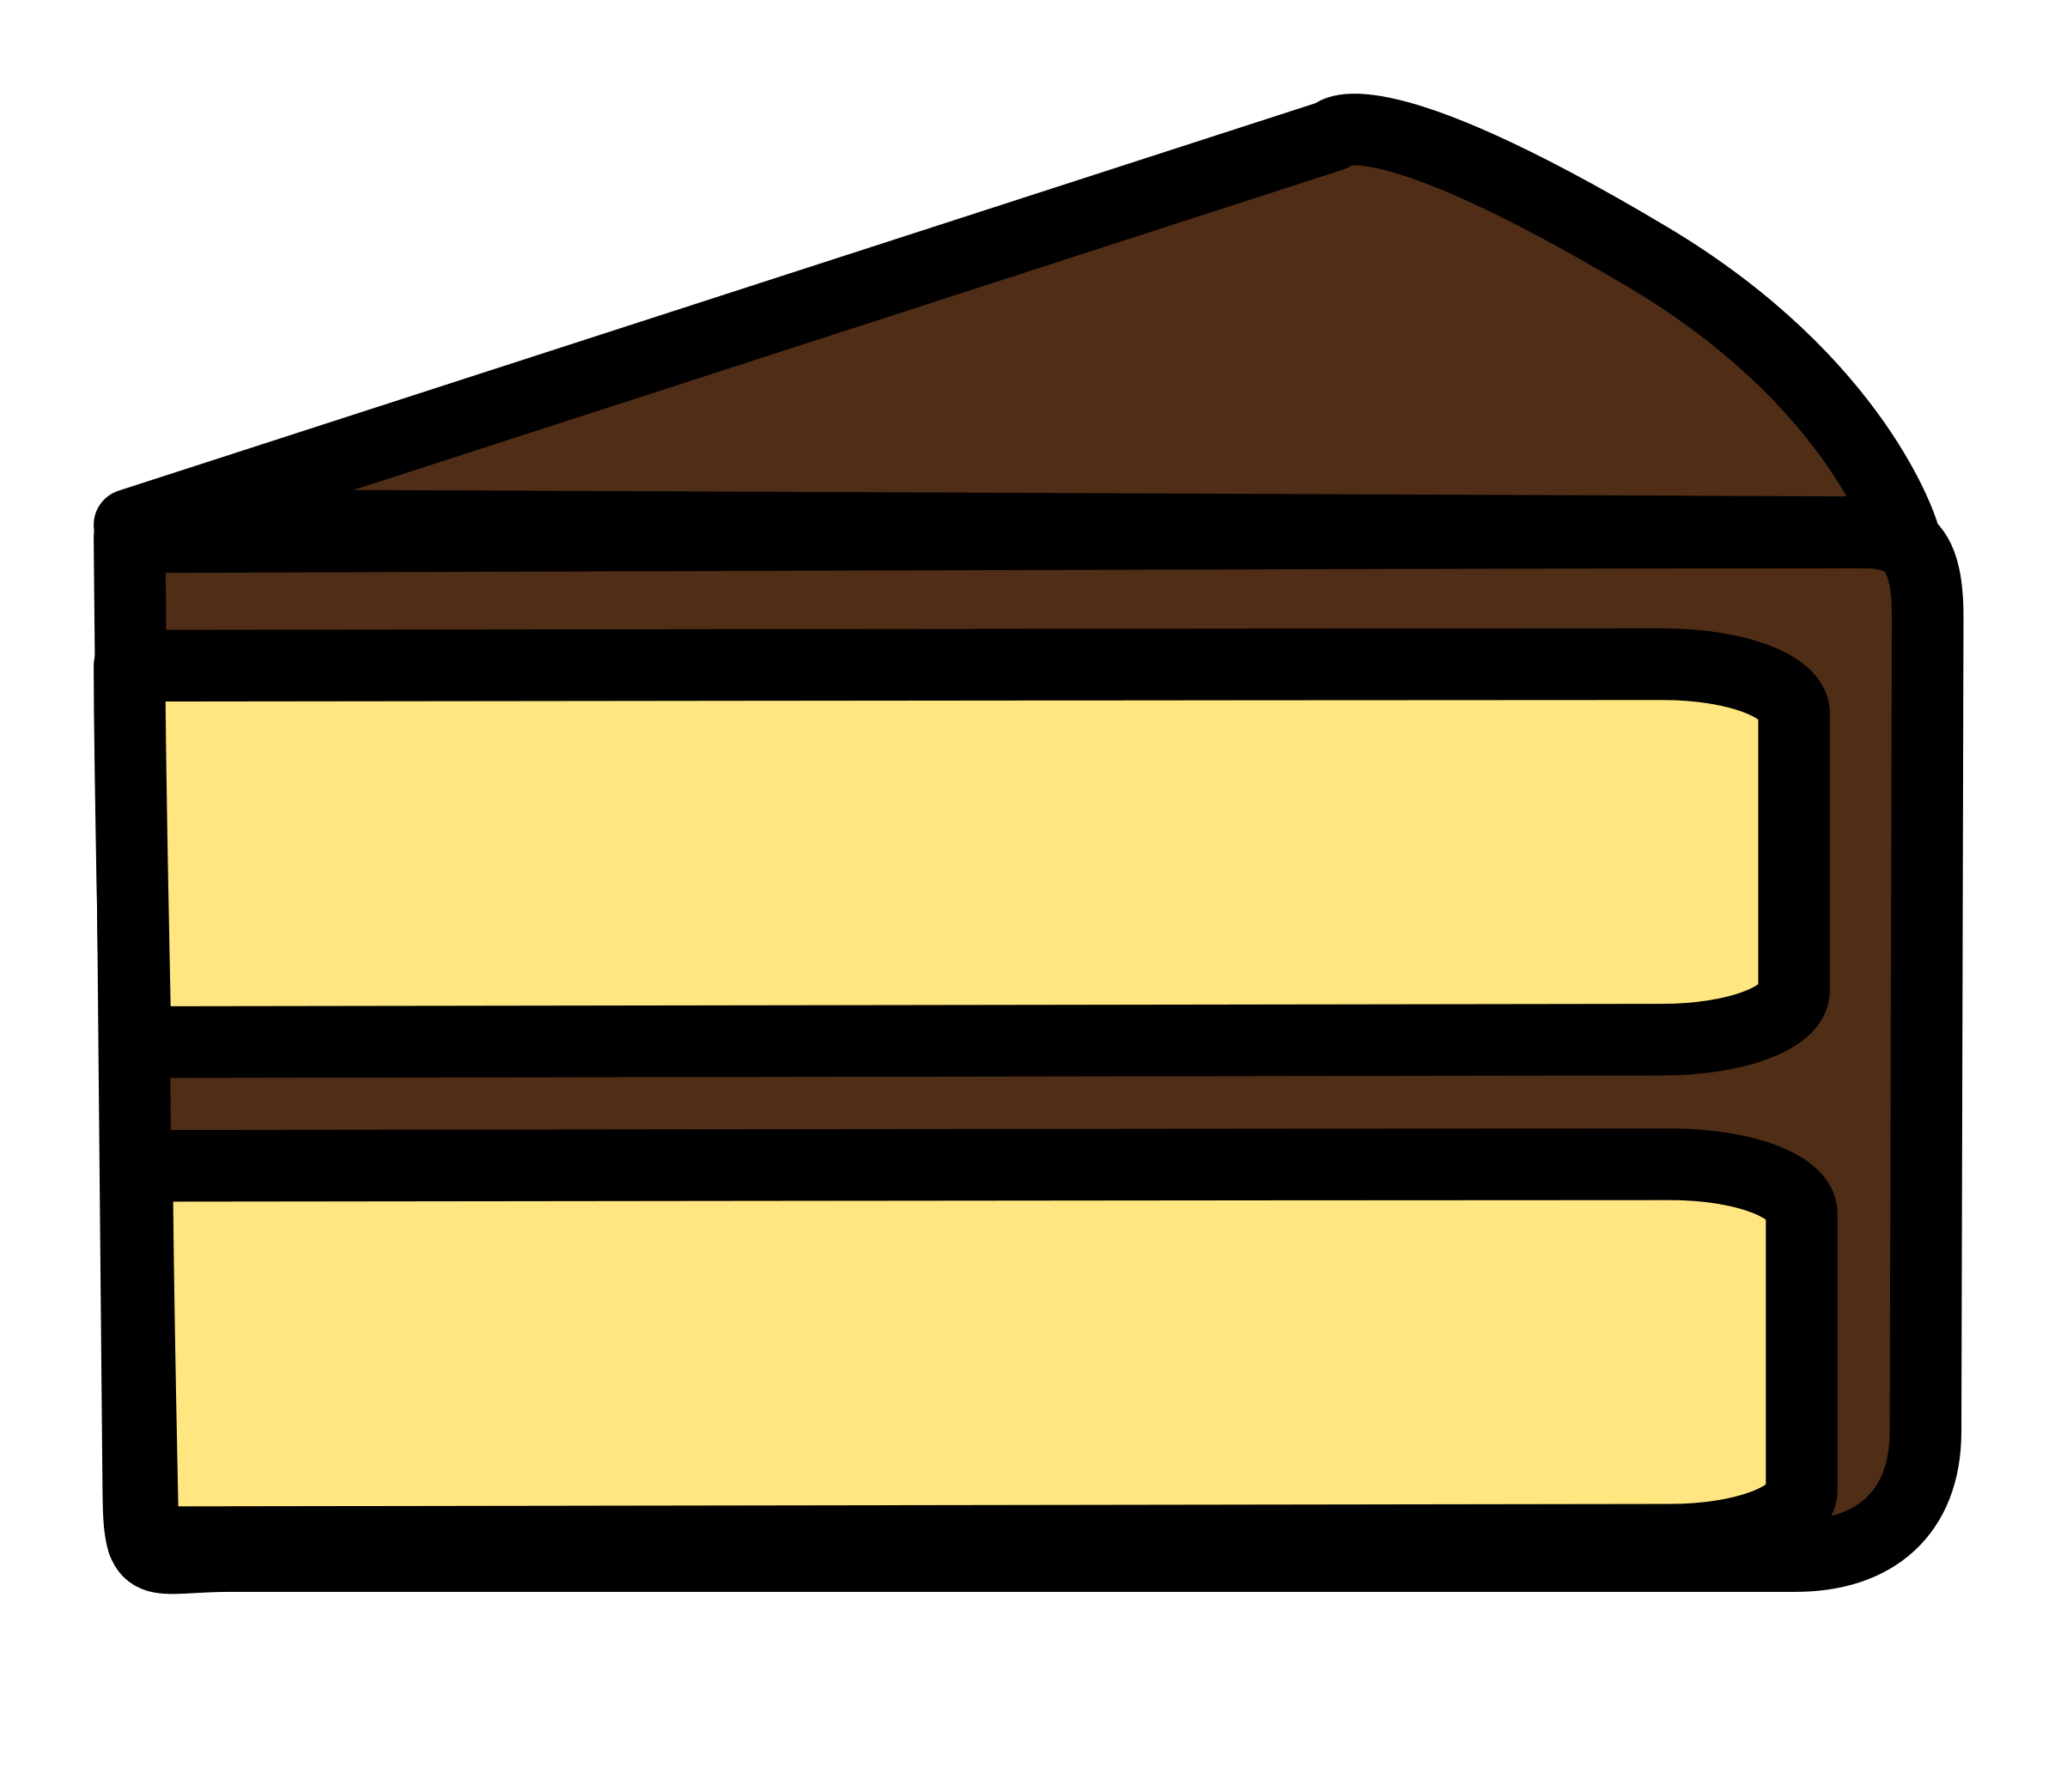 Station. Clipart cake cake slice